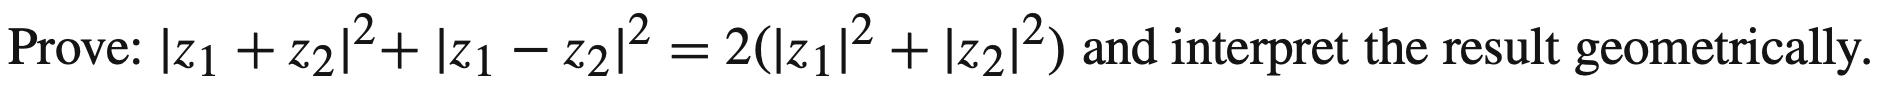 Prove: 21+z212+ |21 – 2212 = 2(12112 + |z212) and interpret the result geometrically.